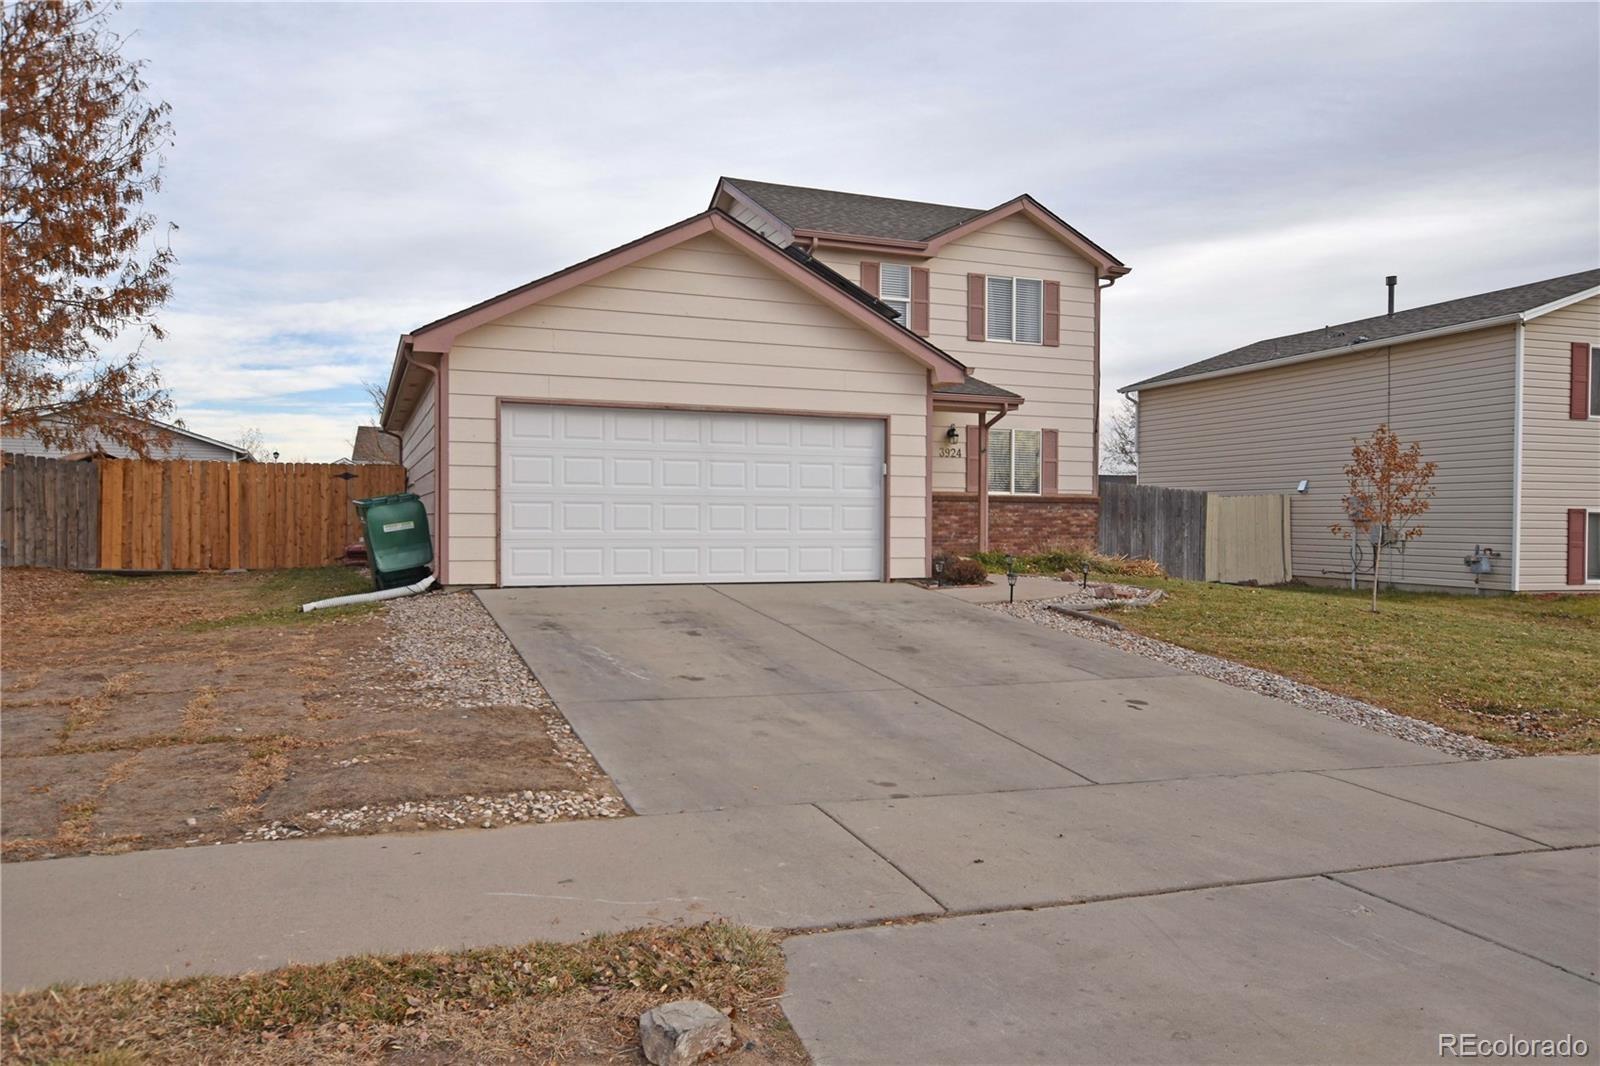 MLS# 9206879 - 3 - 3924 Eagles Nest Drive, Evans, CO 80620